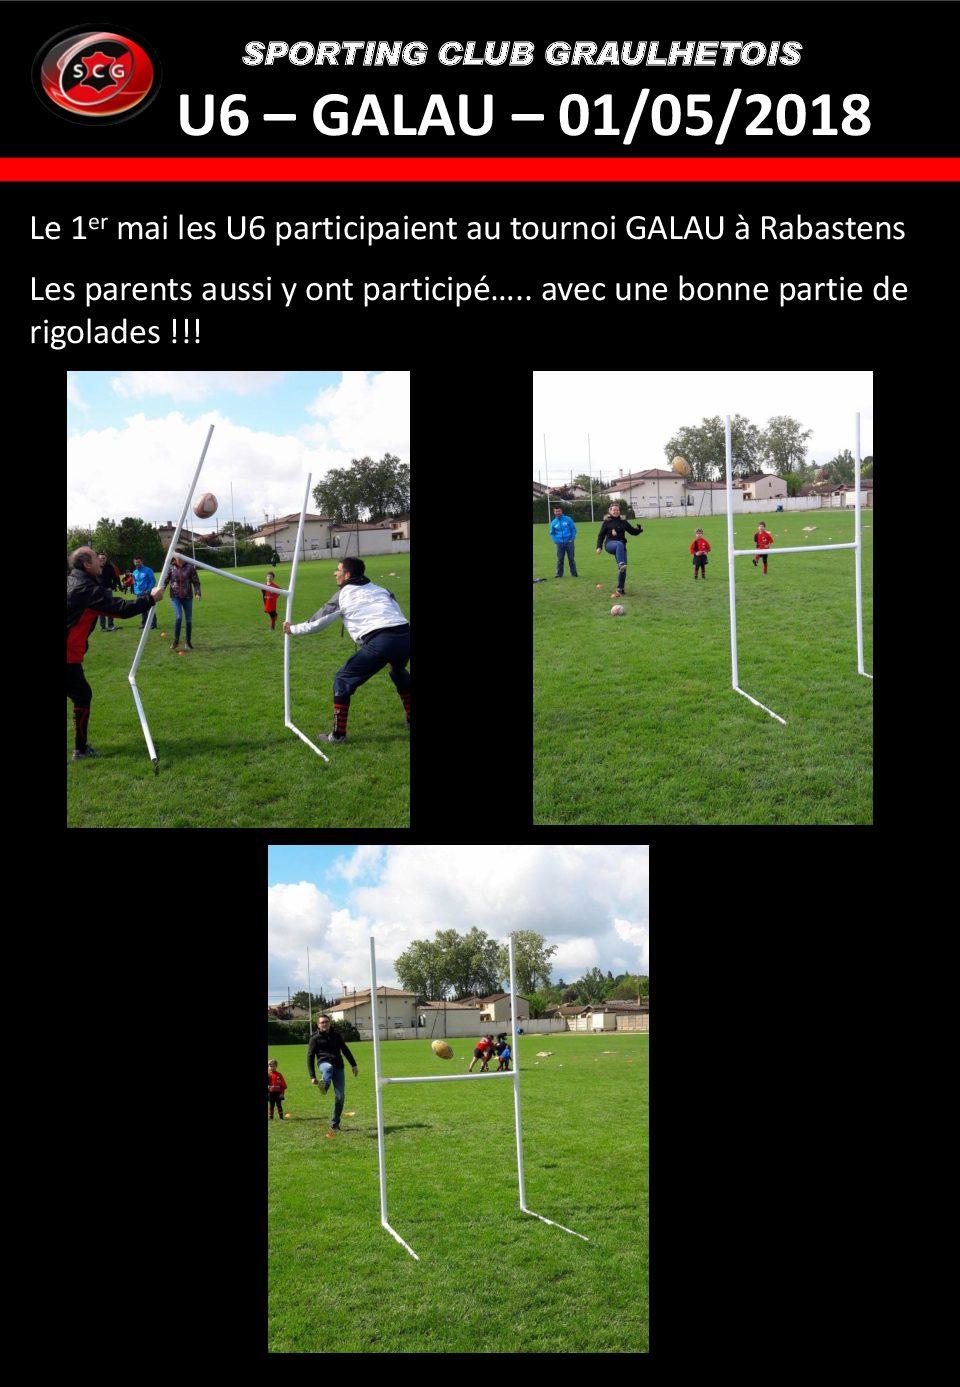 http://scg-rugby.com/wp-content/uploads/2018/05/GALAU-6-2-1-pdf-2.jpg